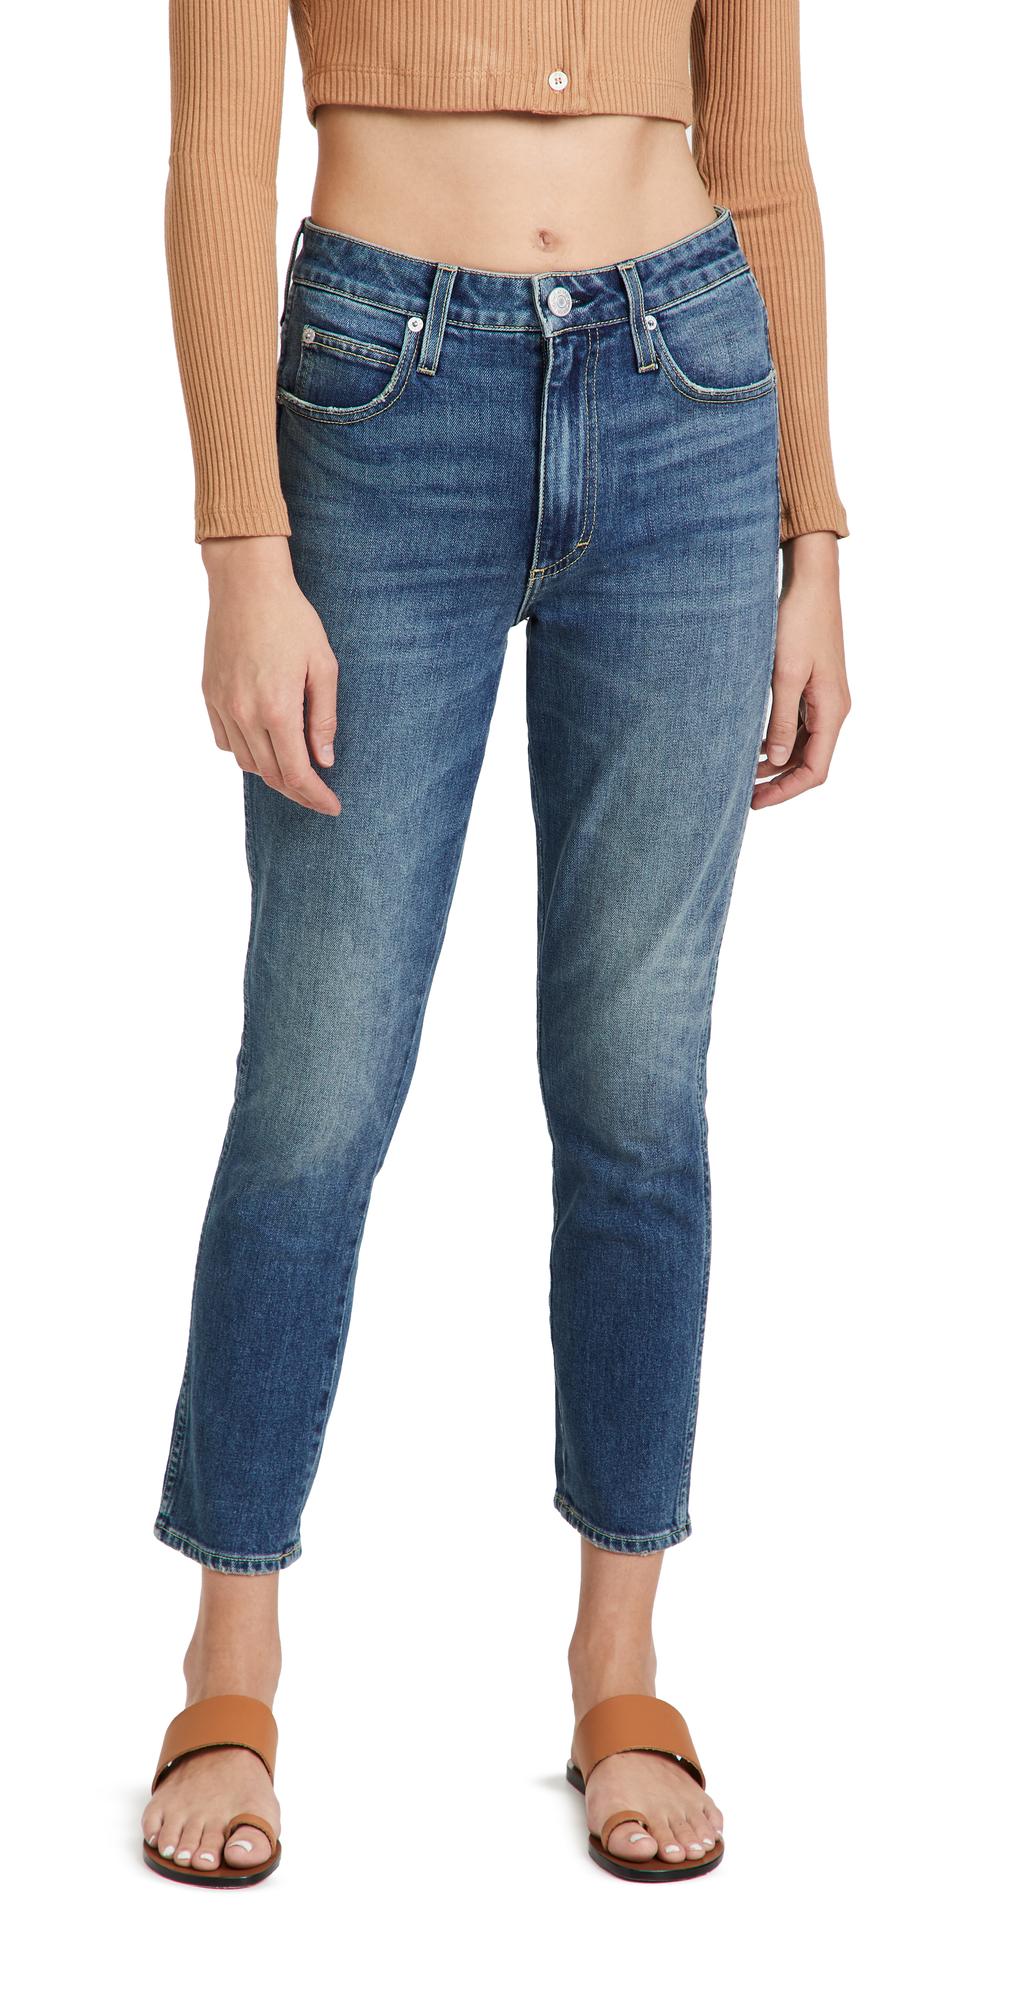 Chelsea Crop Jeans